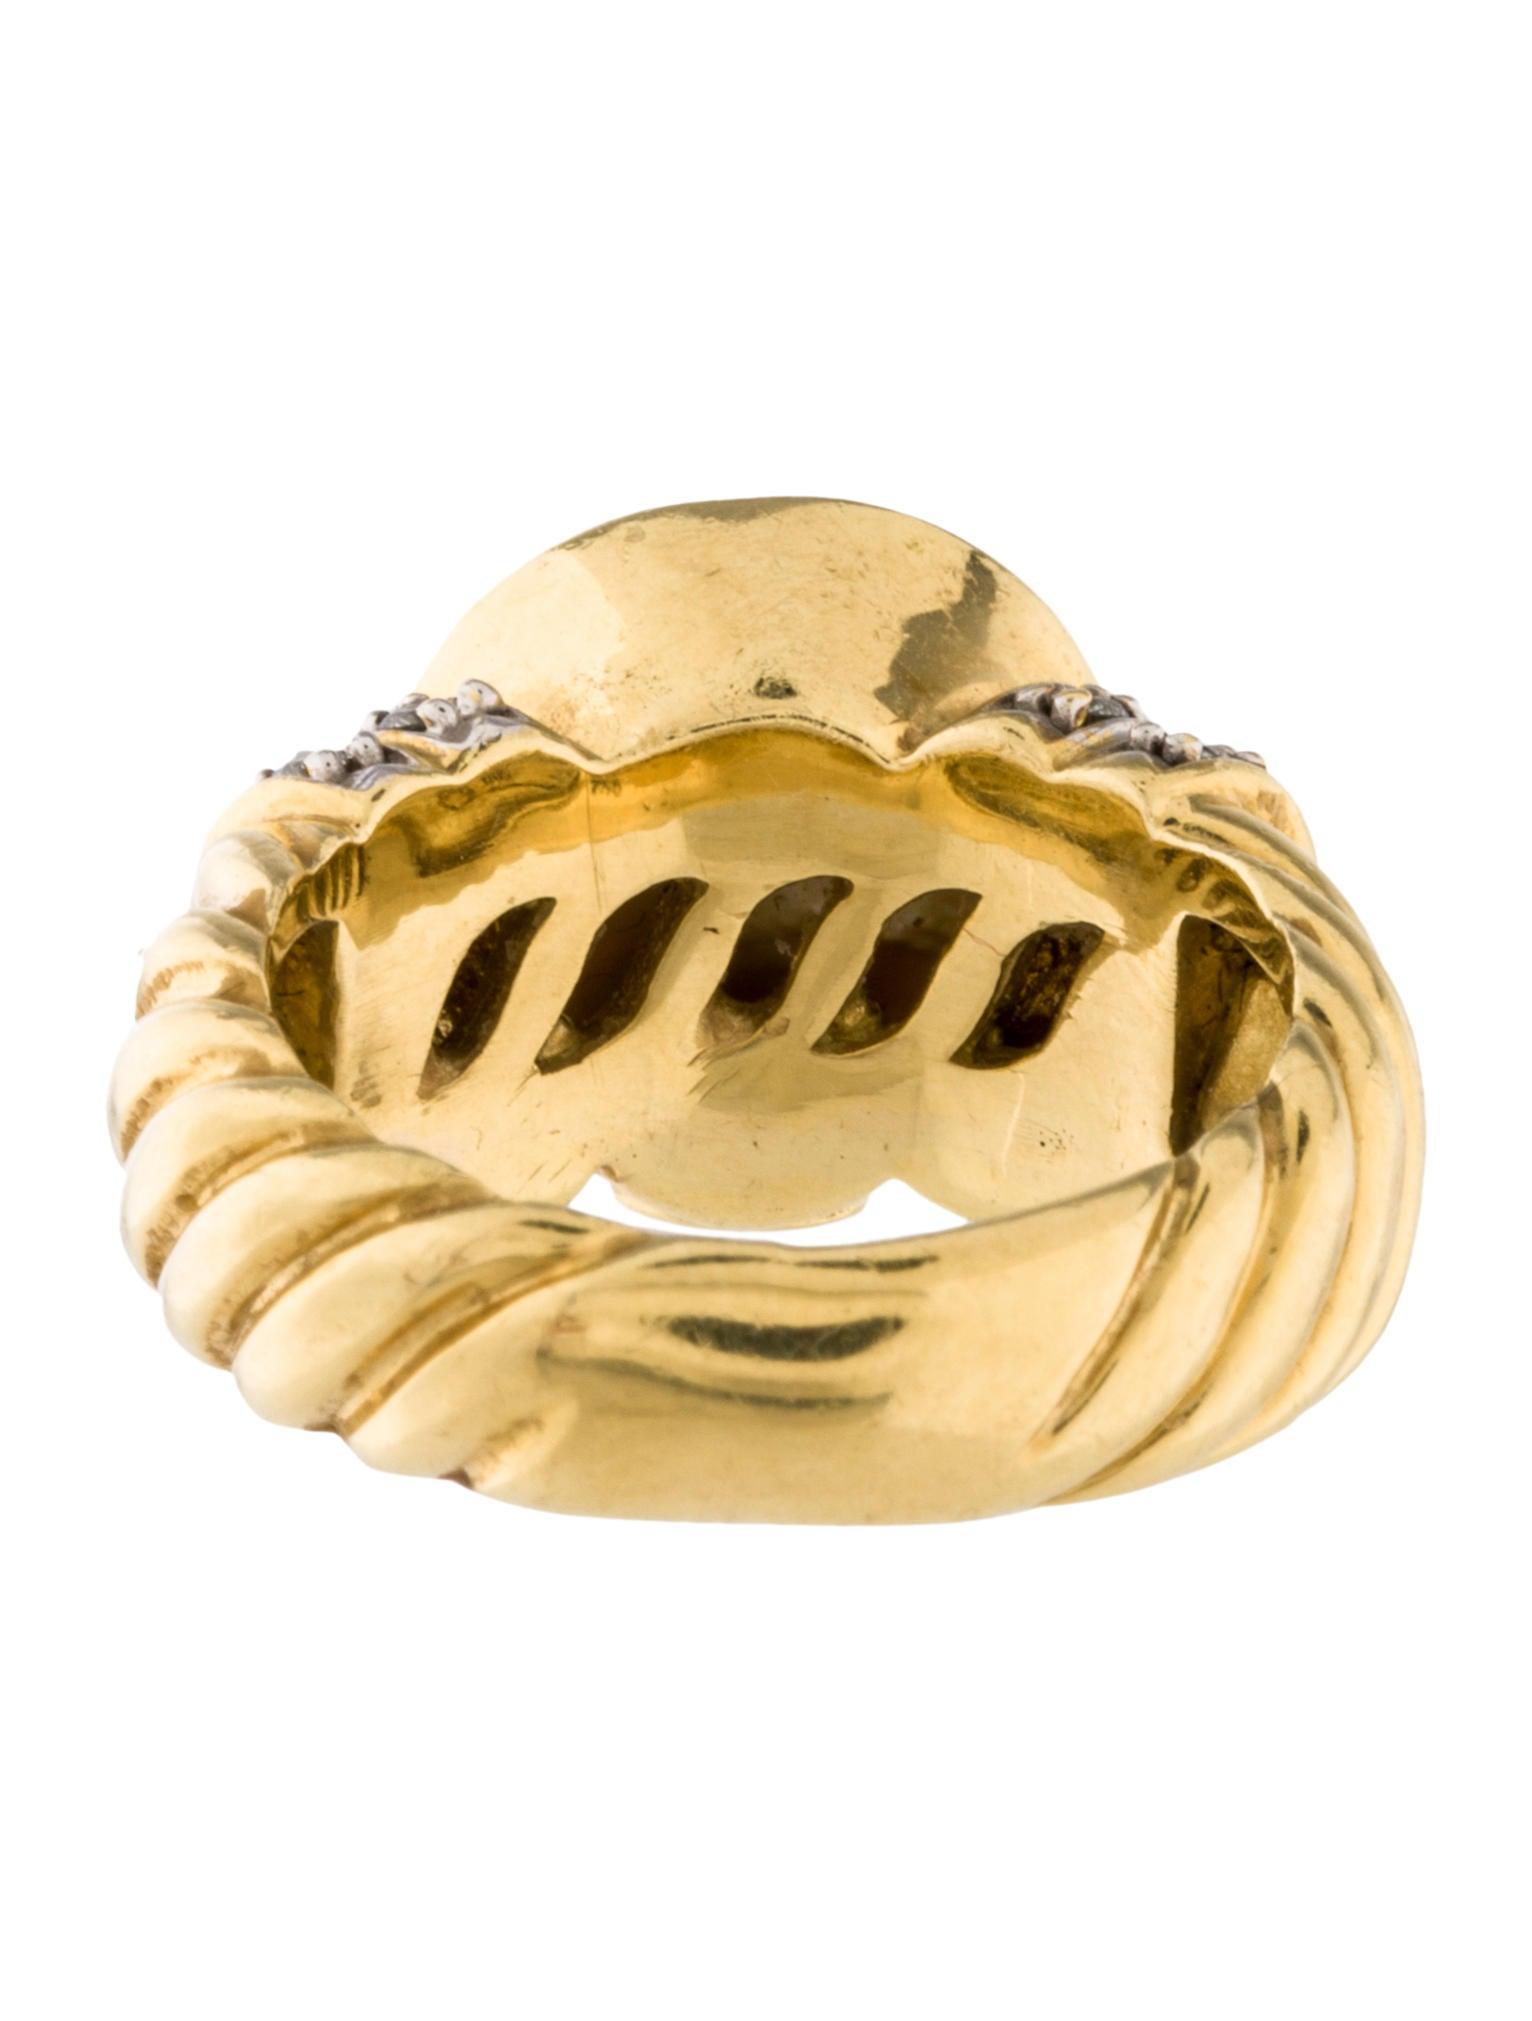 david yurman pearl diamond ring rings dvy35132 the. Black Bedroom Furniture Sets. Home Design Ideas